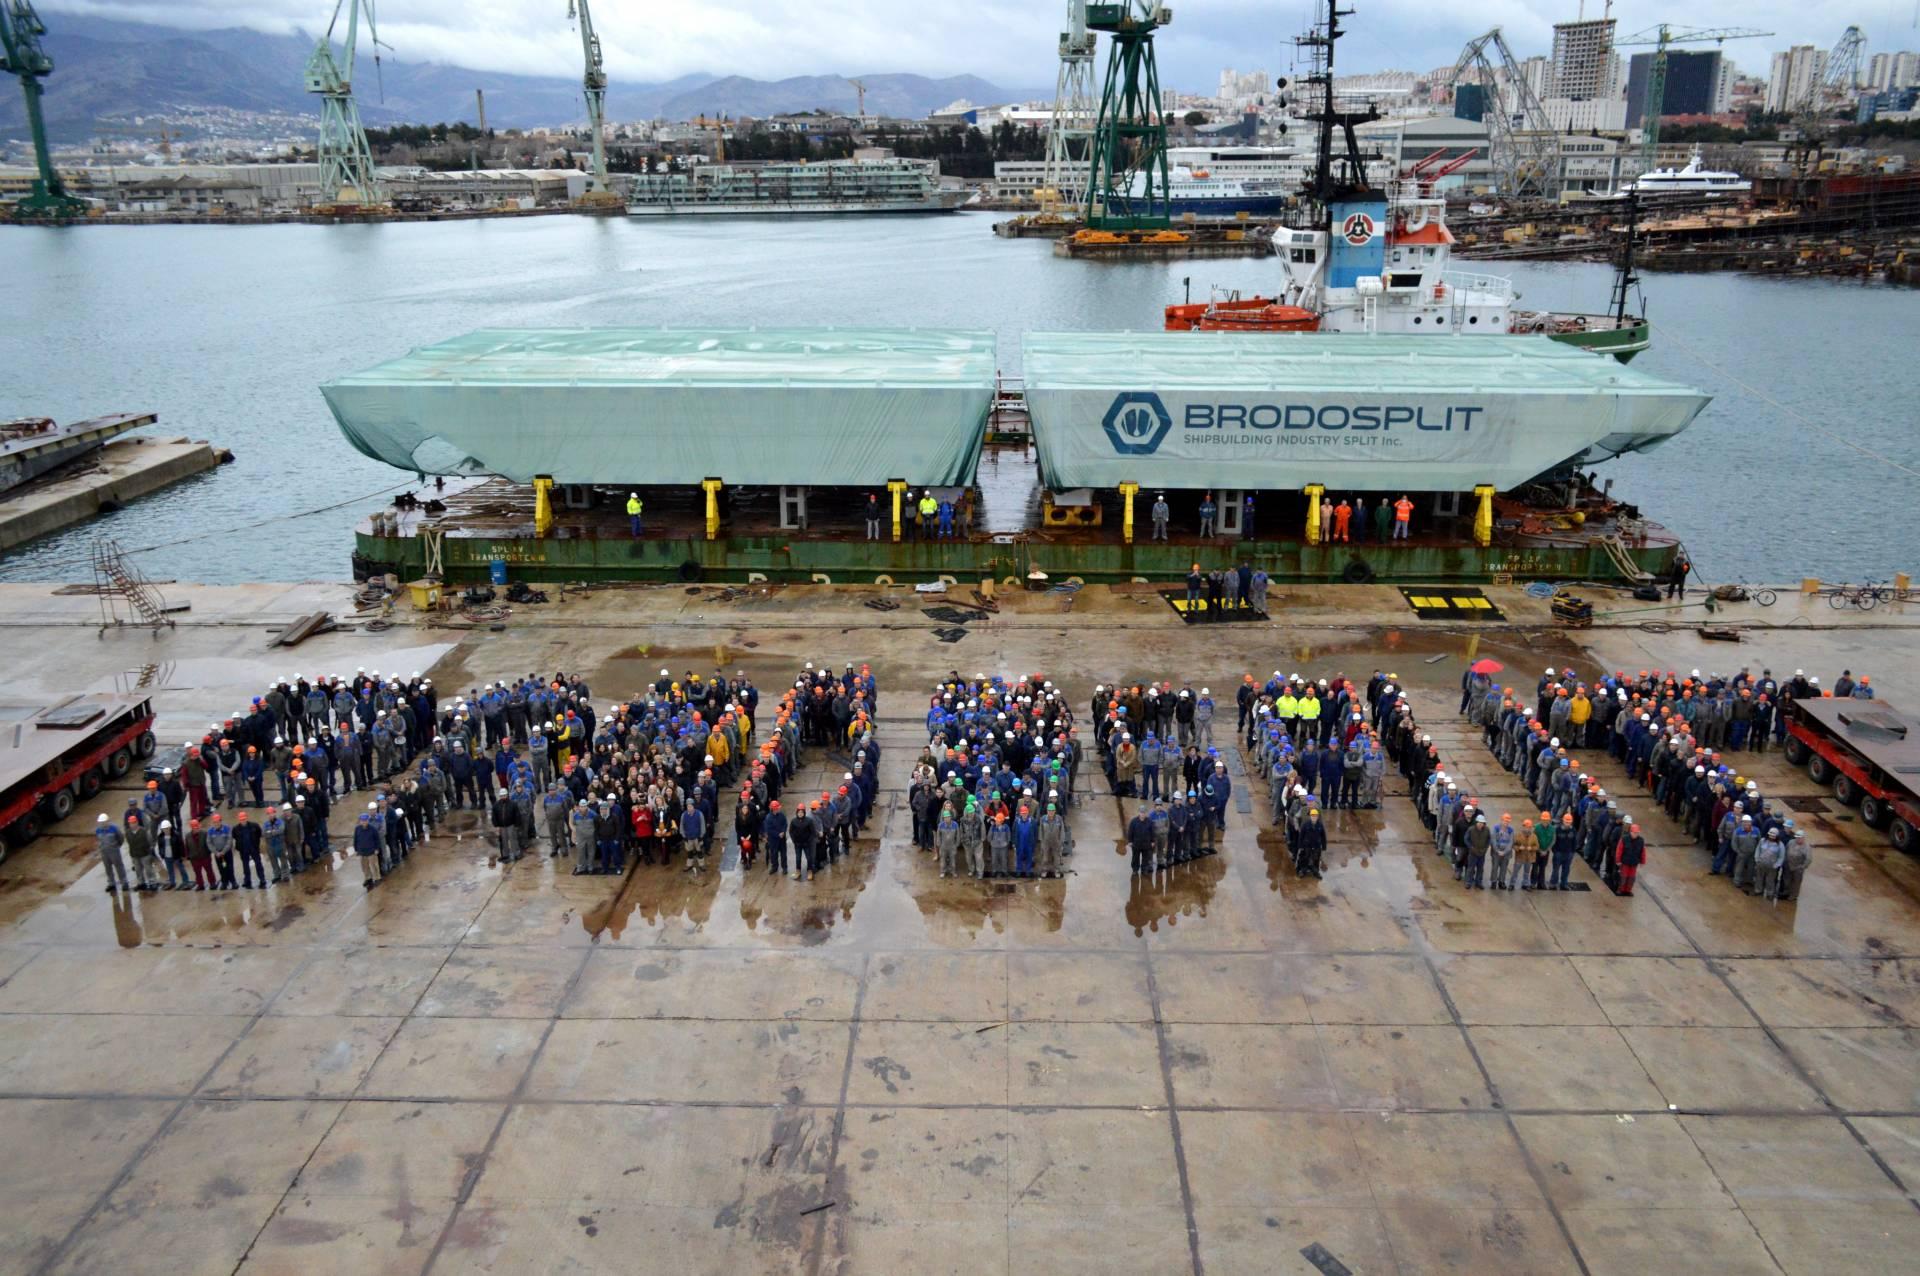 Croatian shipyard completes saving venice from flooding project croatian shipyard completes saving venice from flooding project nvjuhfo Choice Image